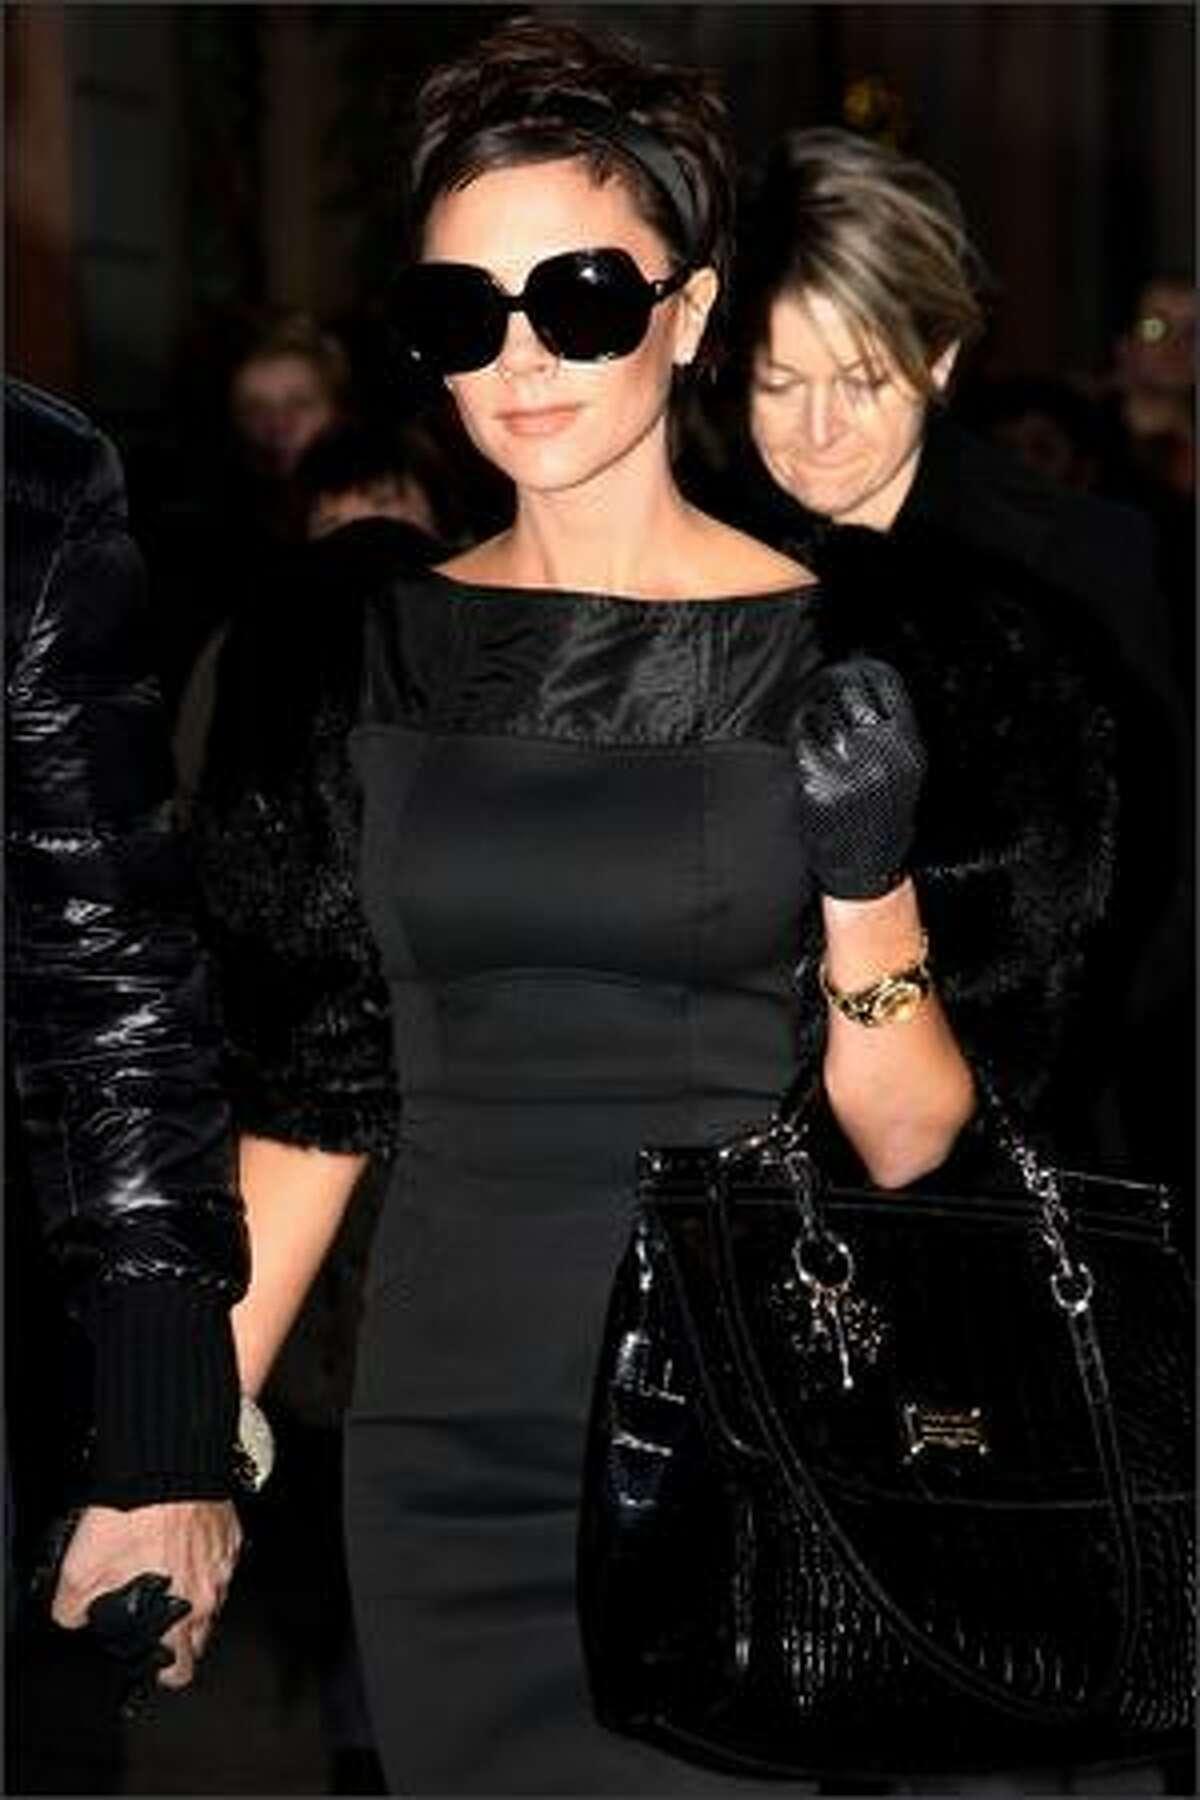 Singer Victoria Beckham is seen December 21, 2008 in Milan, Italy.